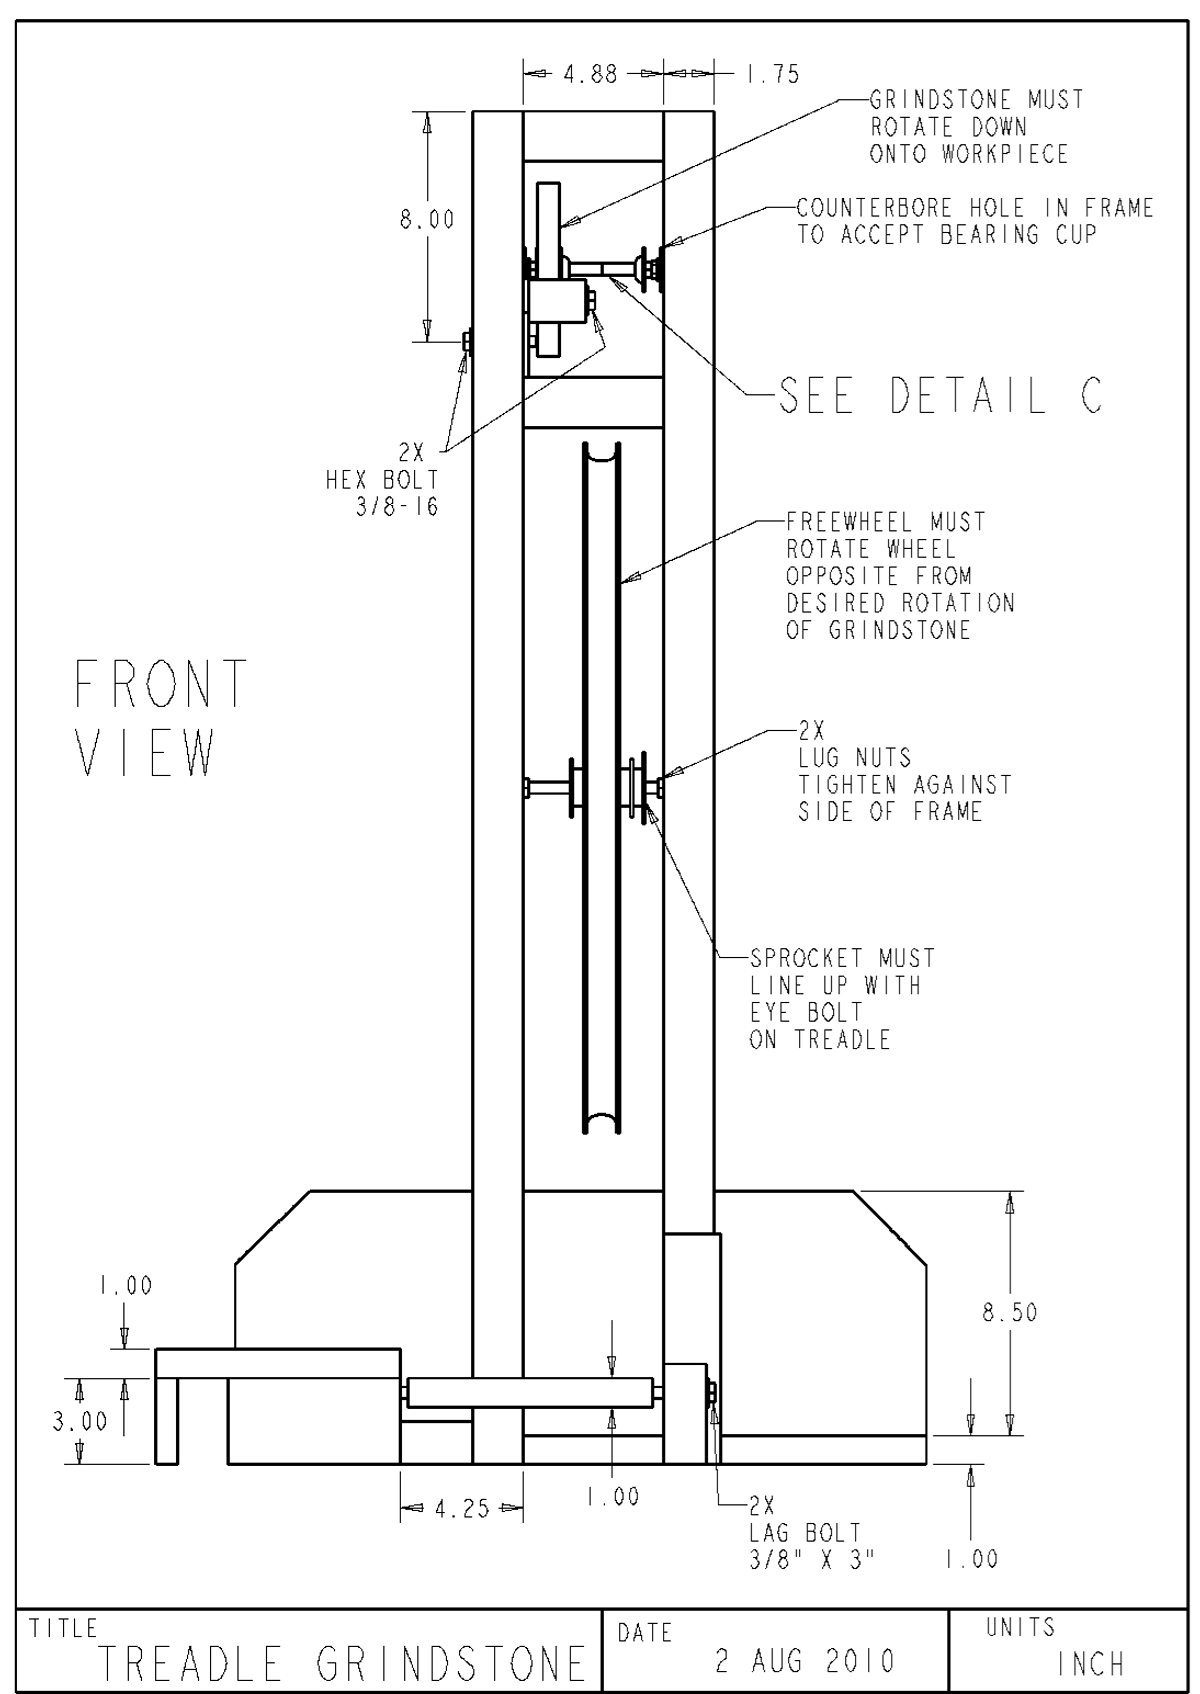 TN62 diagram 2